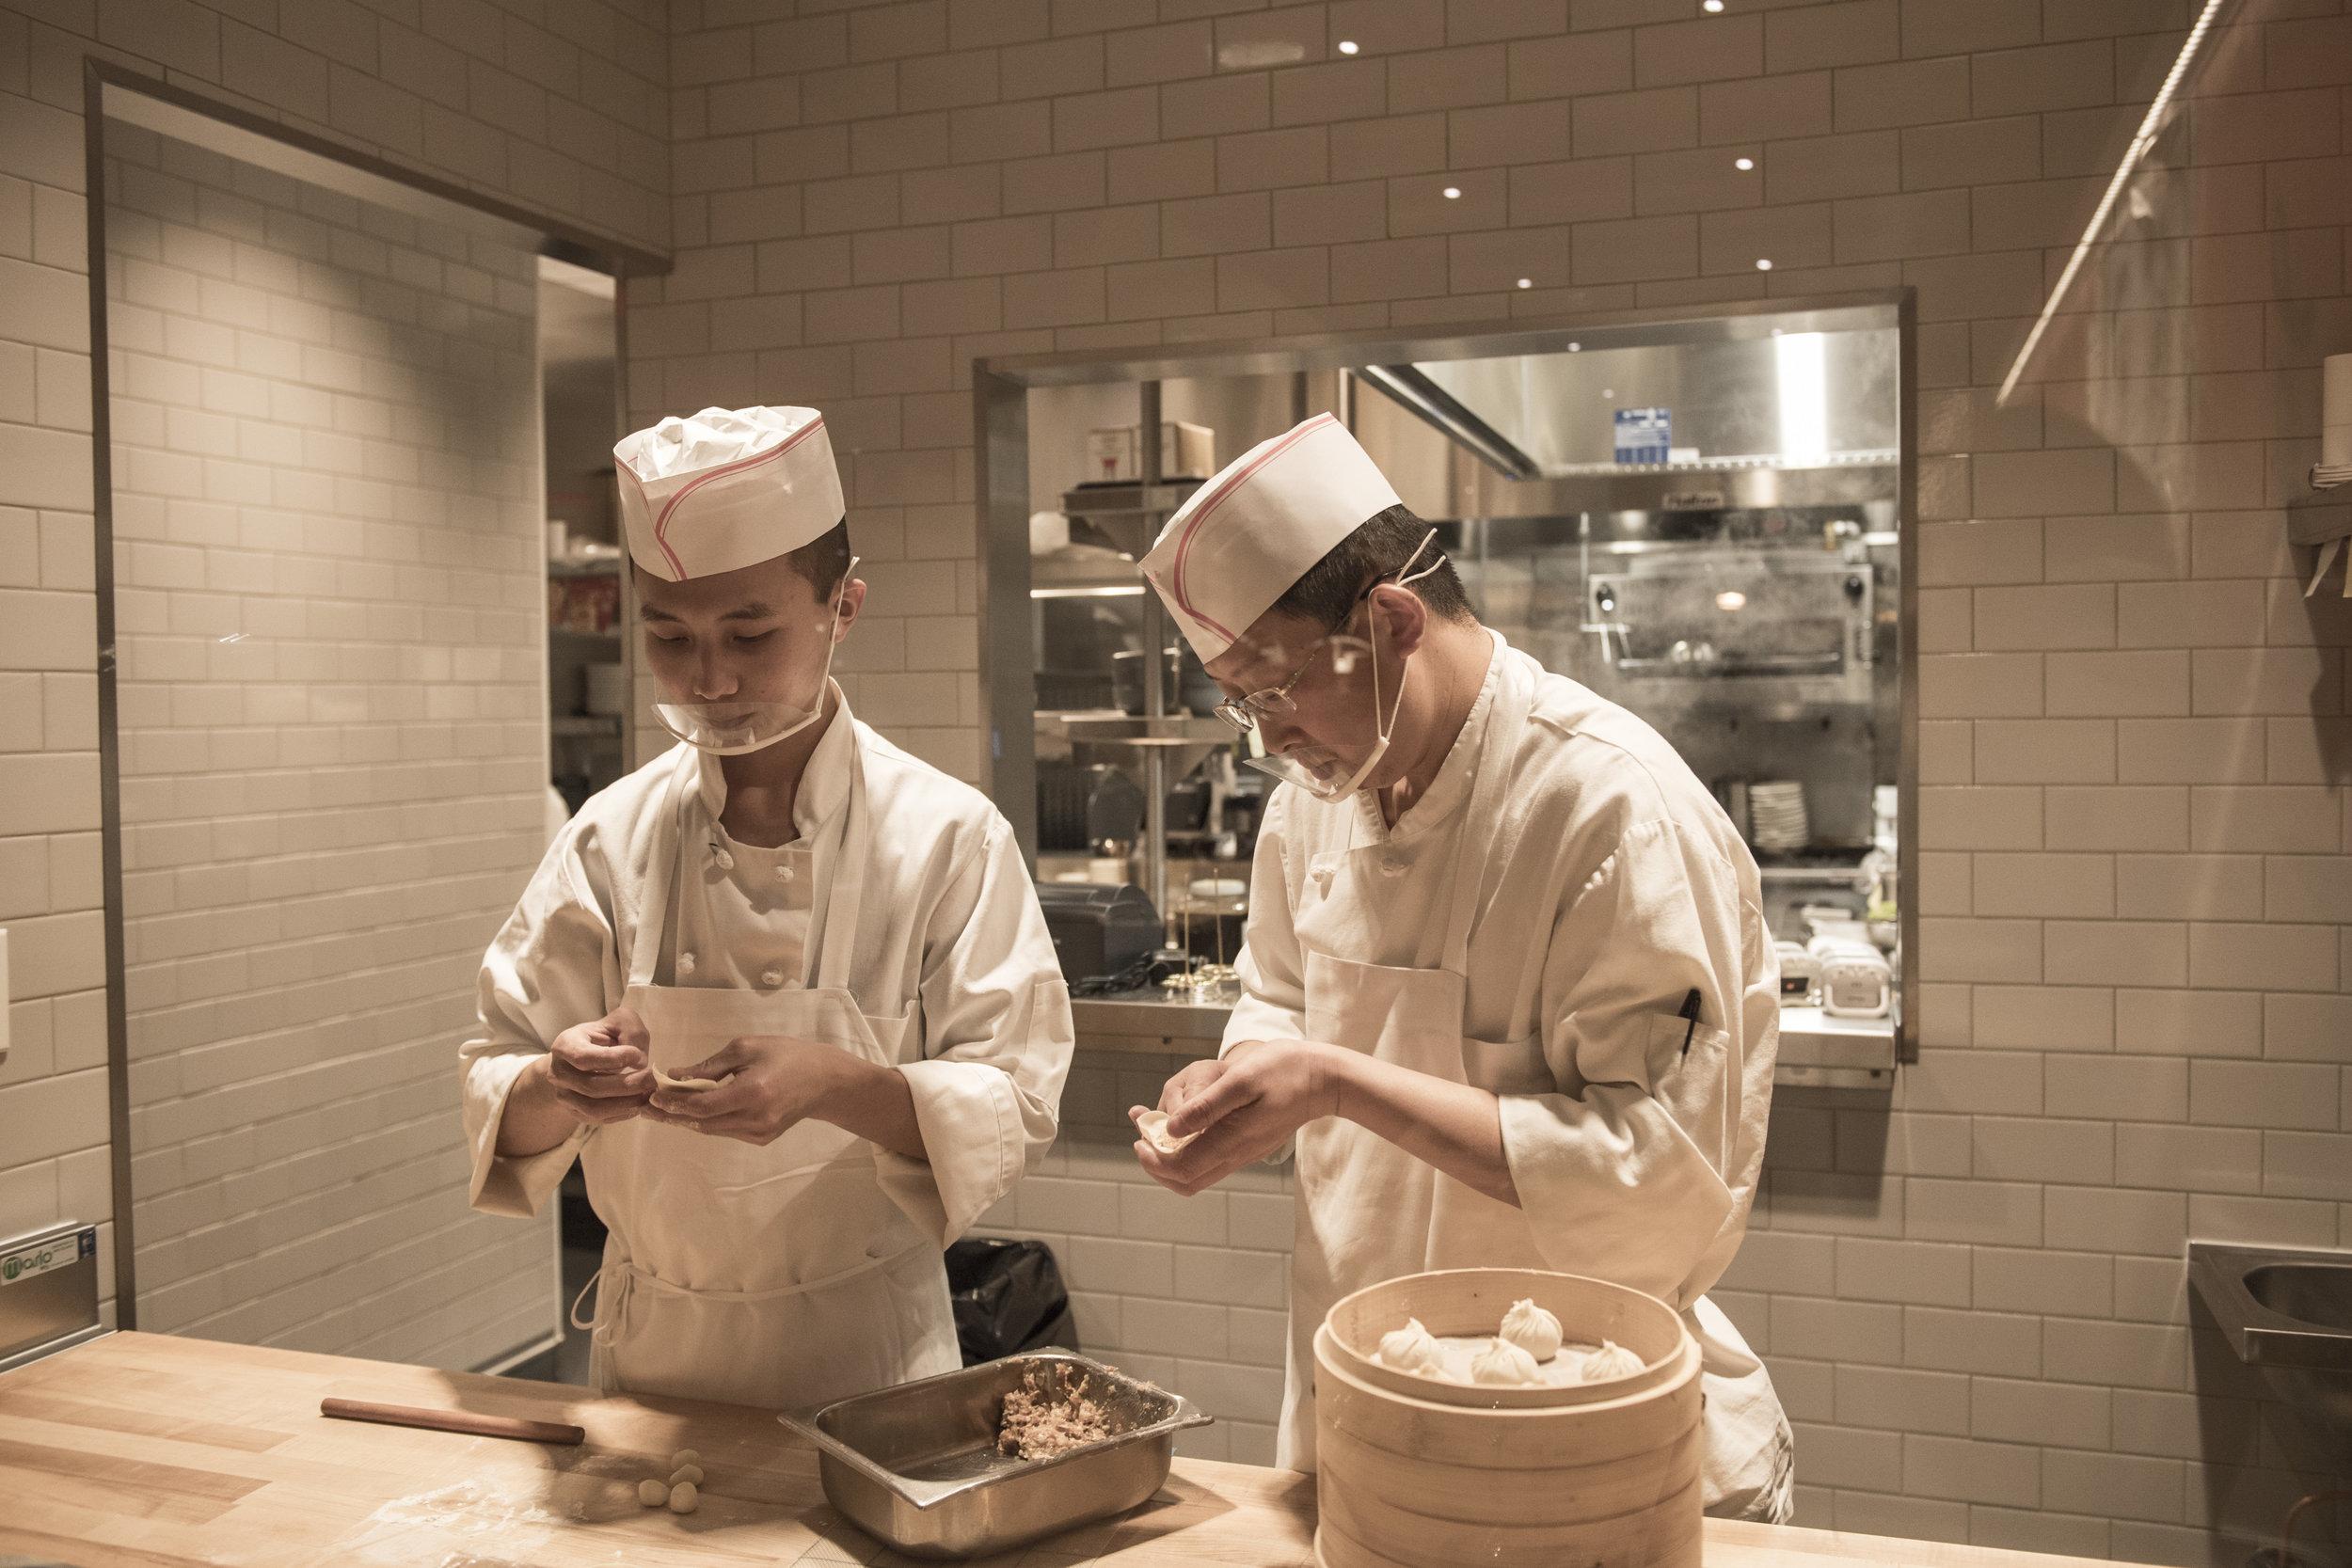 Pinch Chinese Chefs at Work